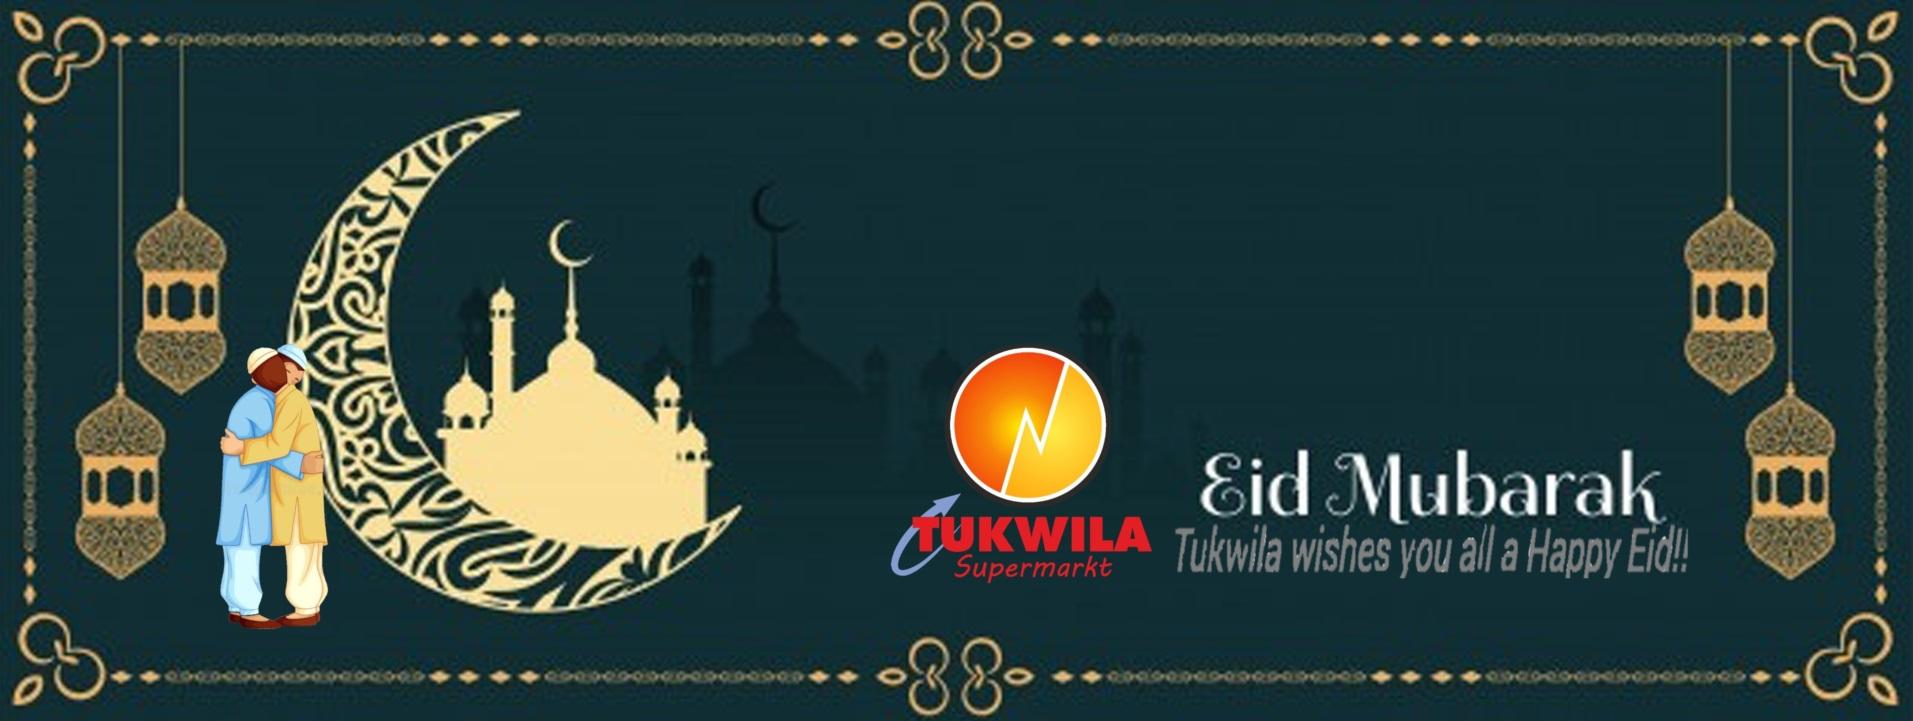 Eid-mubarak-Tukwila online grocery store in Germany